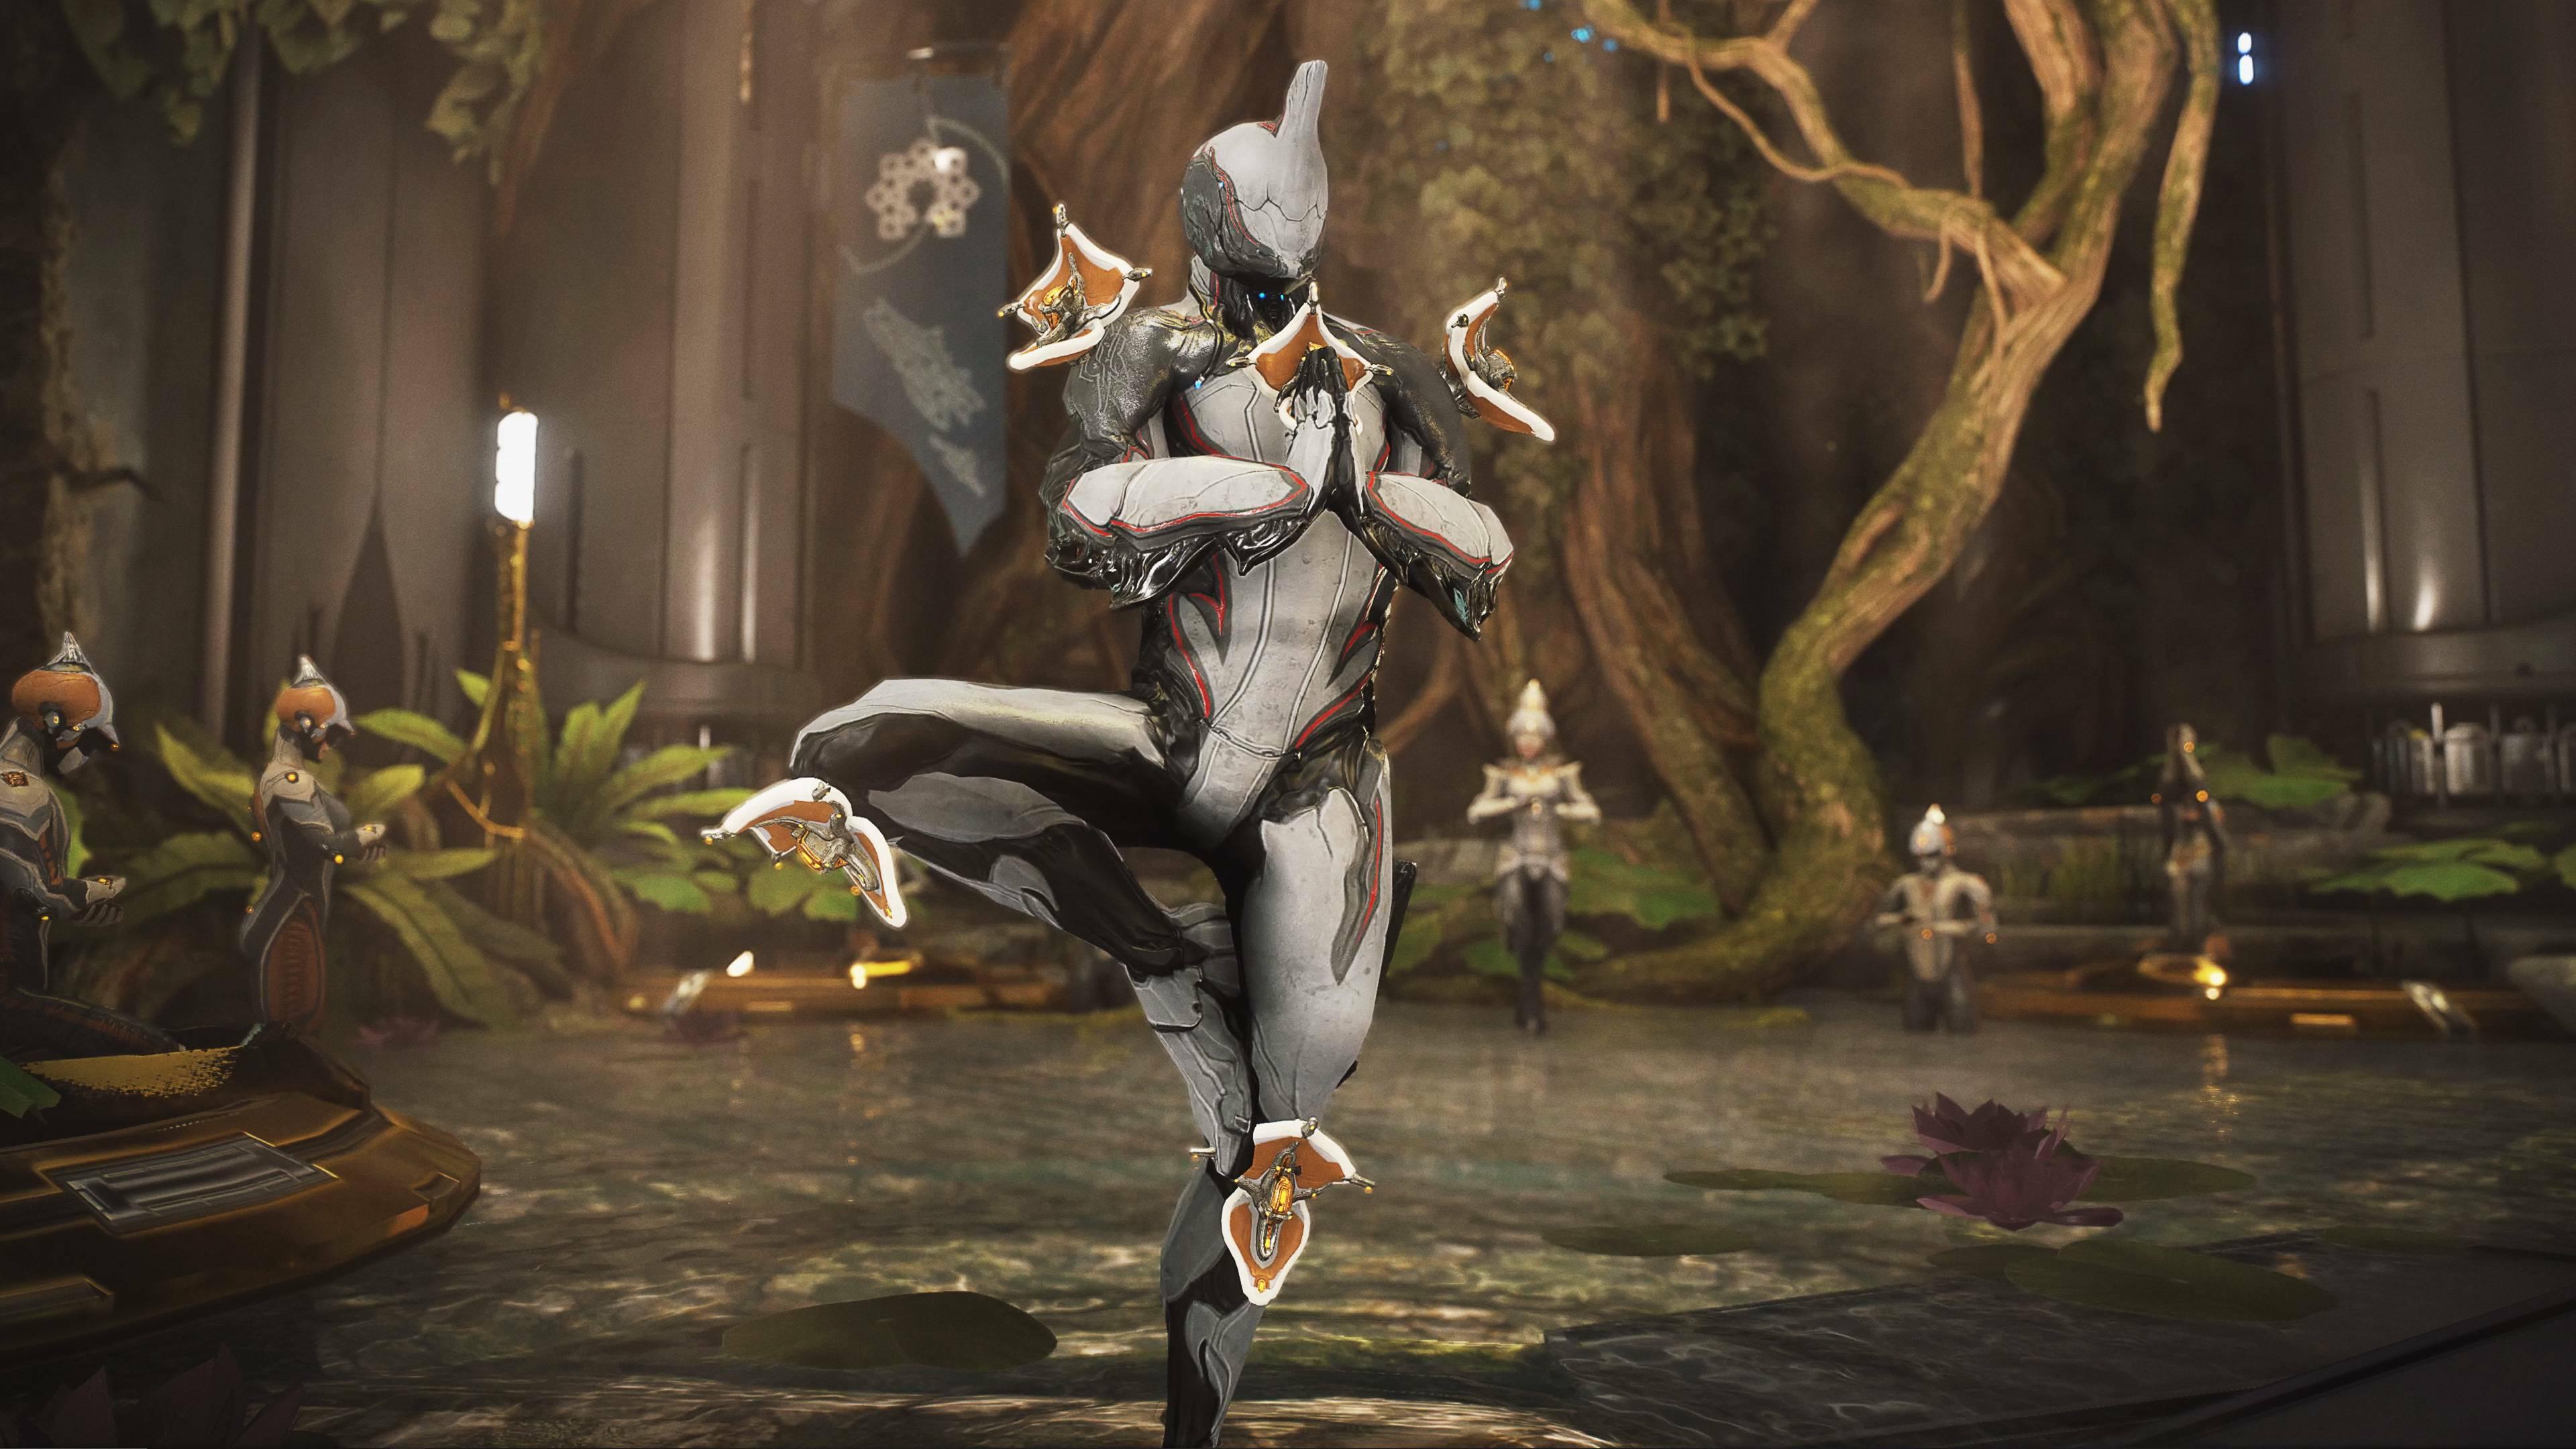 Warframe's Big Sister of Parvos Update Is Now Live - GameSpot